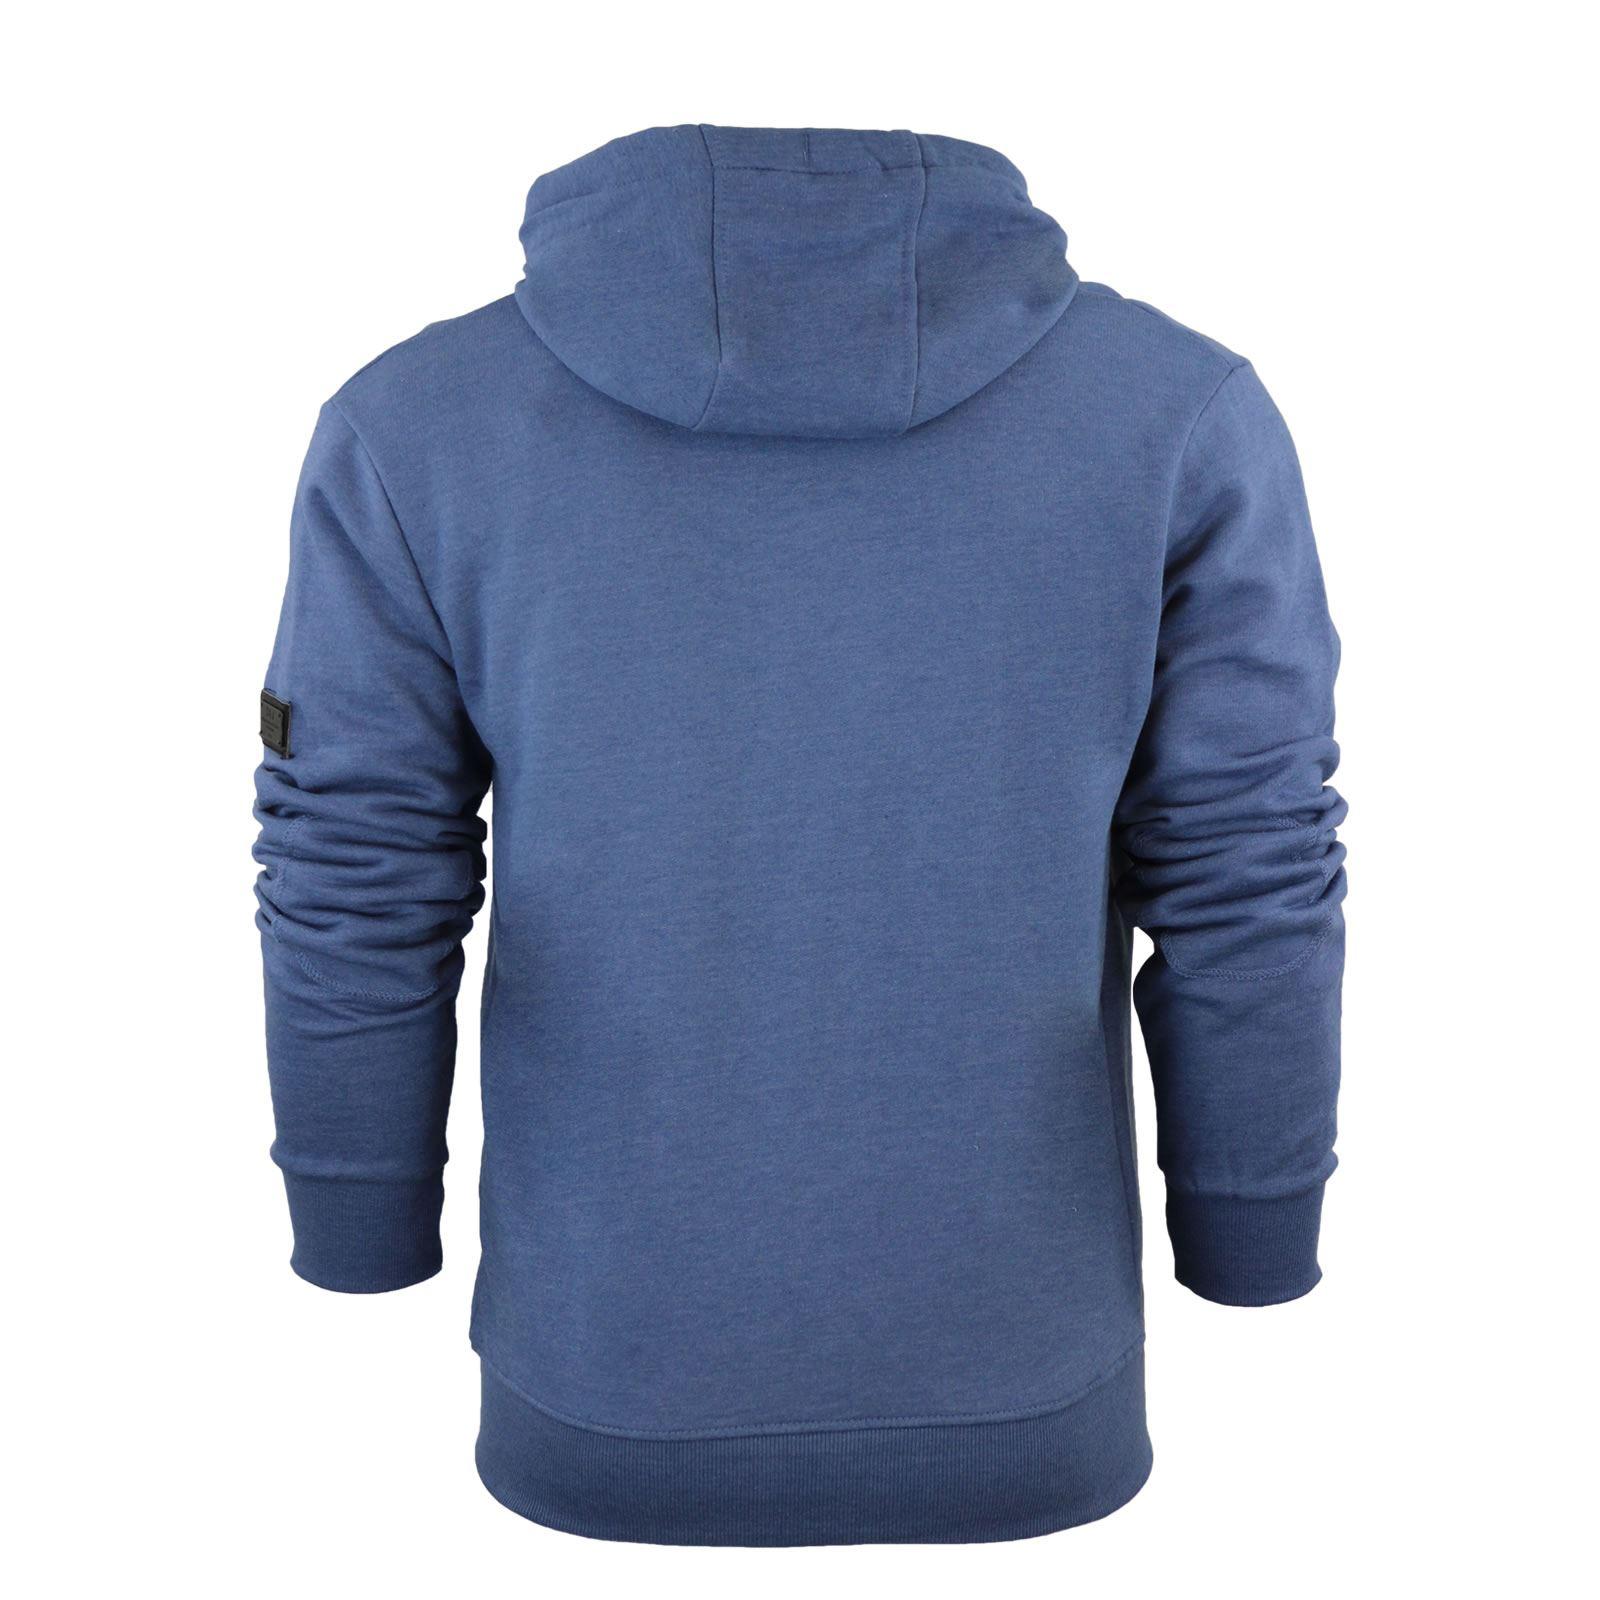 Mens-Hoodie-Smith-amp-Jones-Zip-Up-Hooded-Sweater-Jumper thumbnail 30